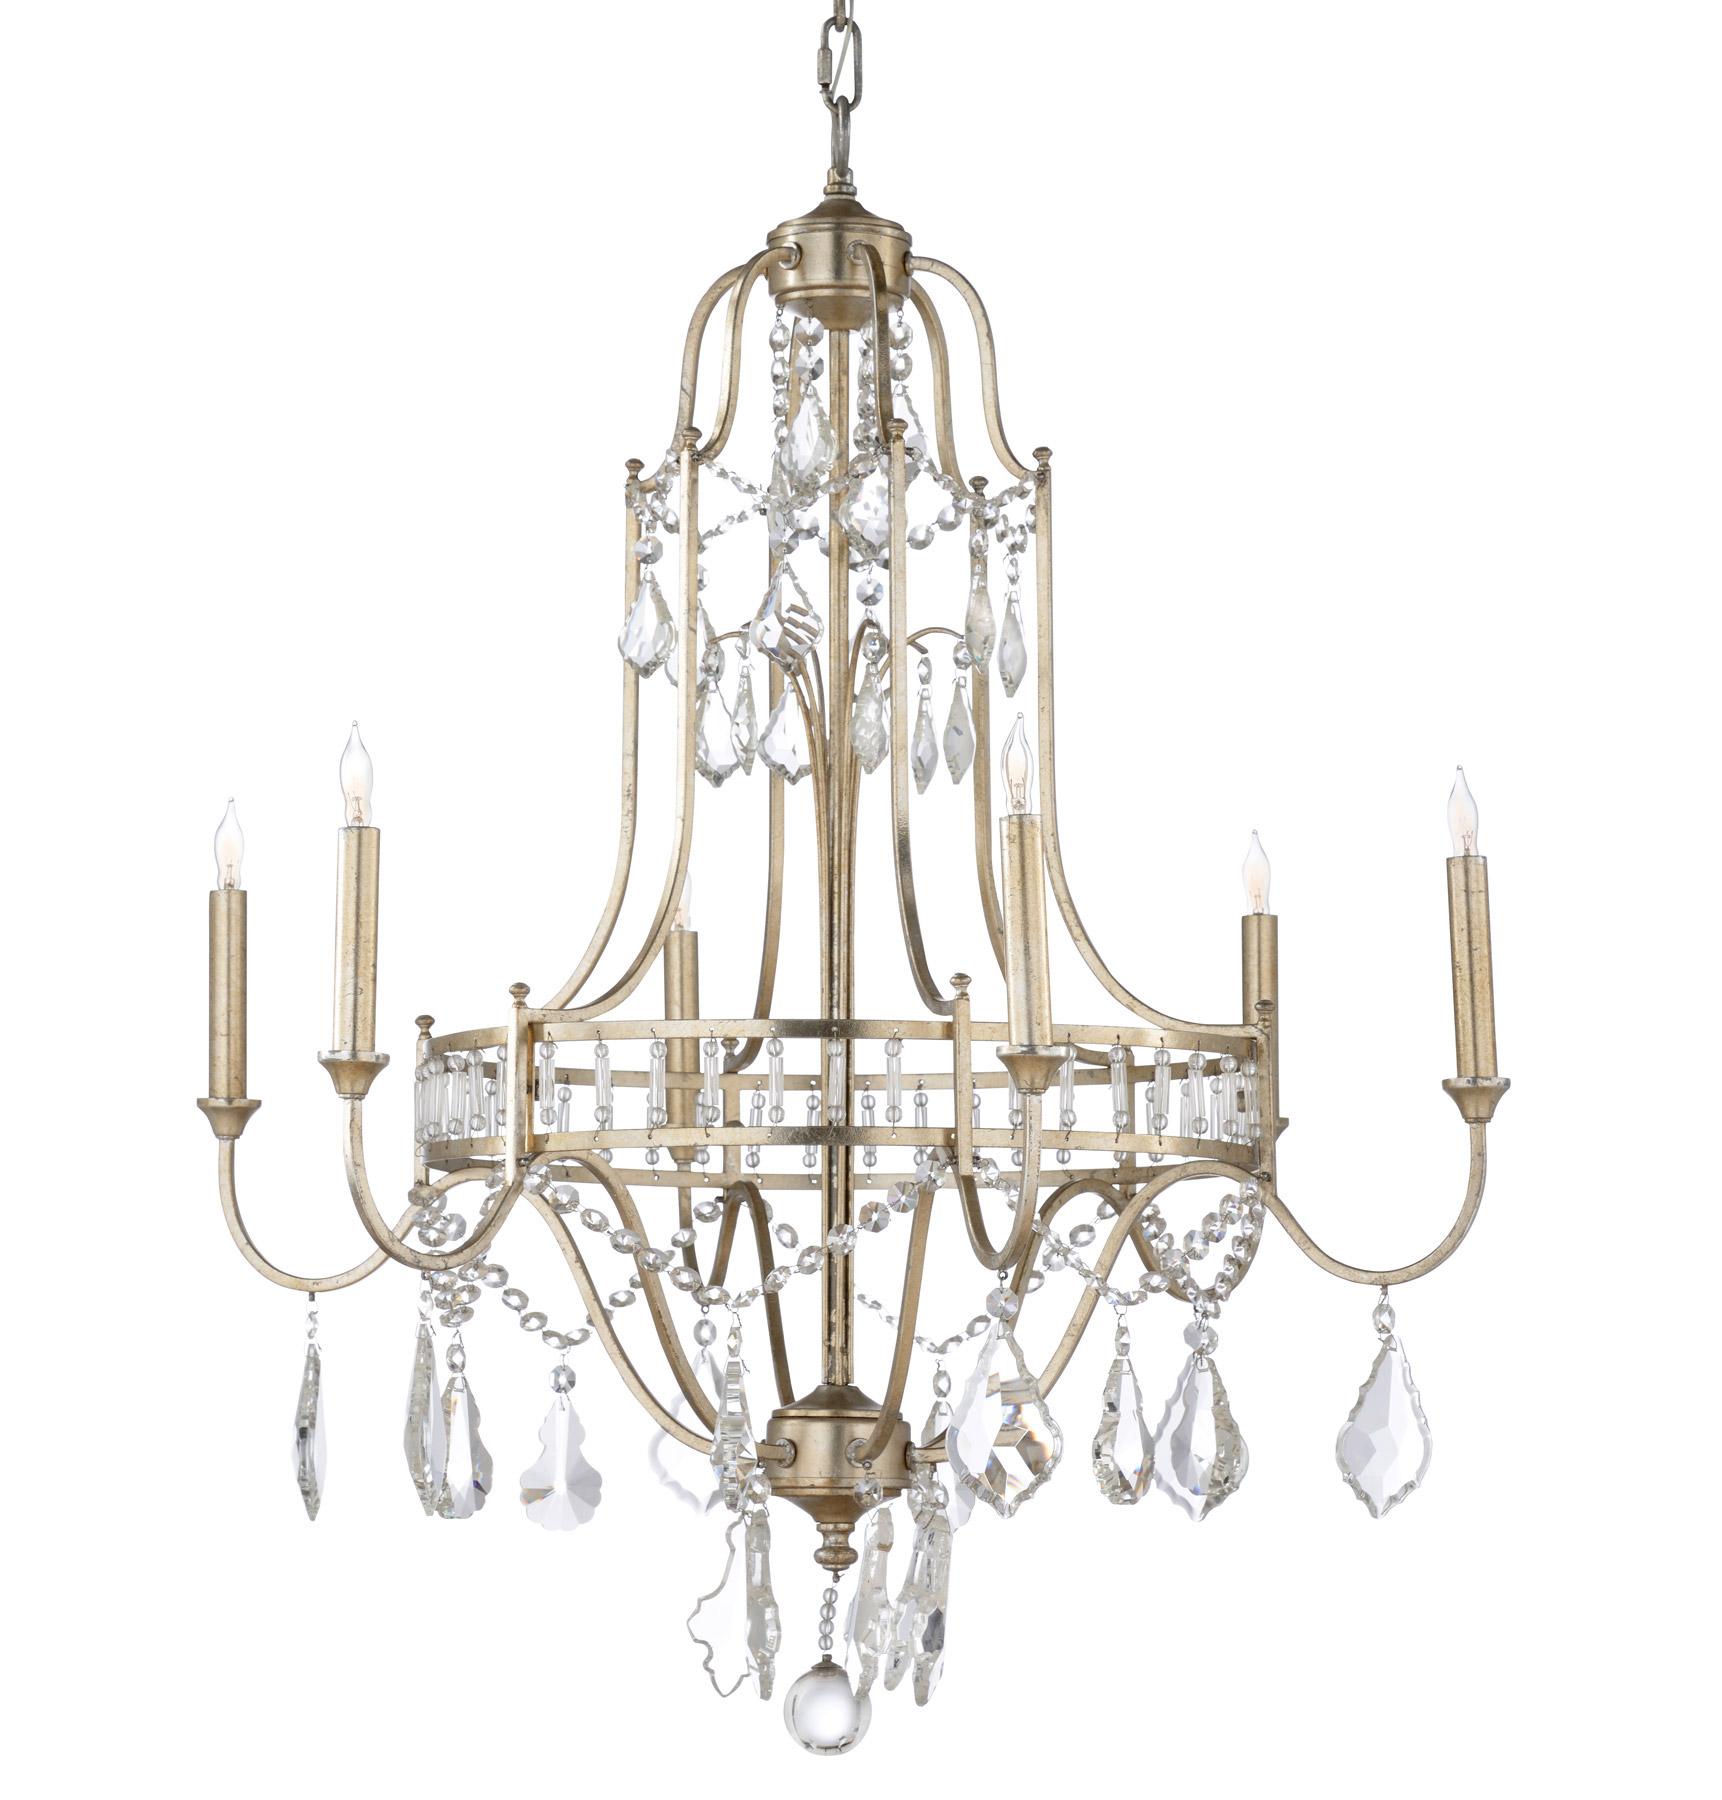 wildwood 67175 crystal buckhead chandelier